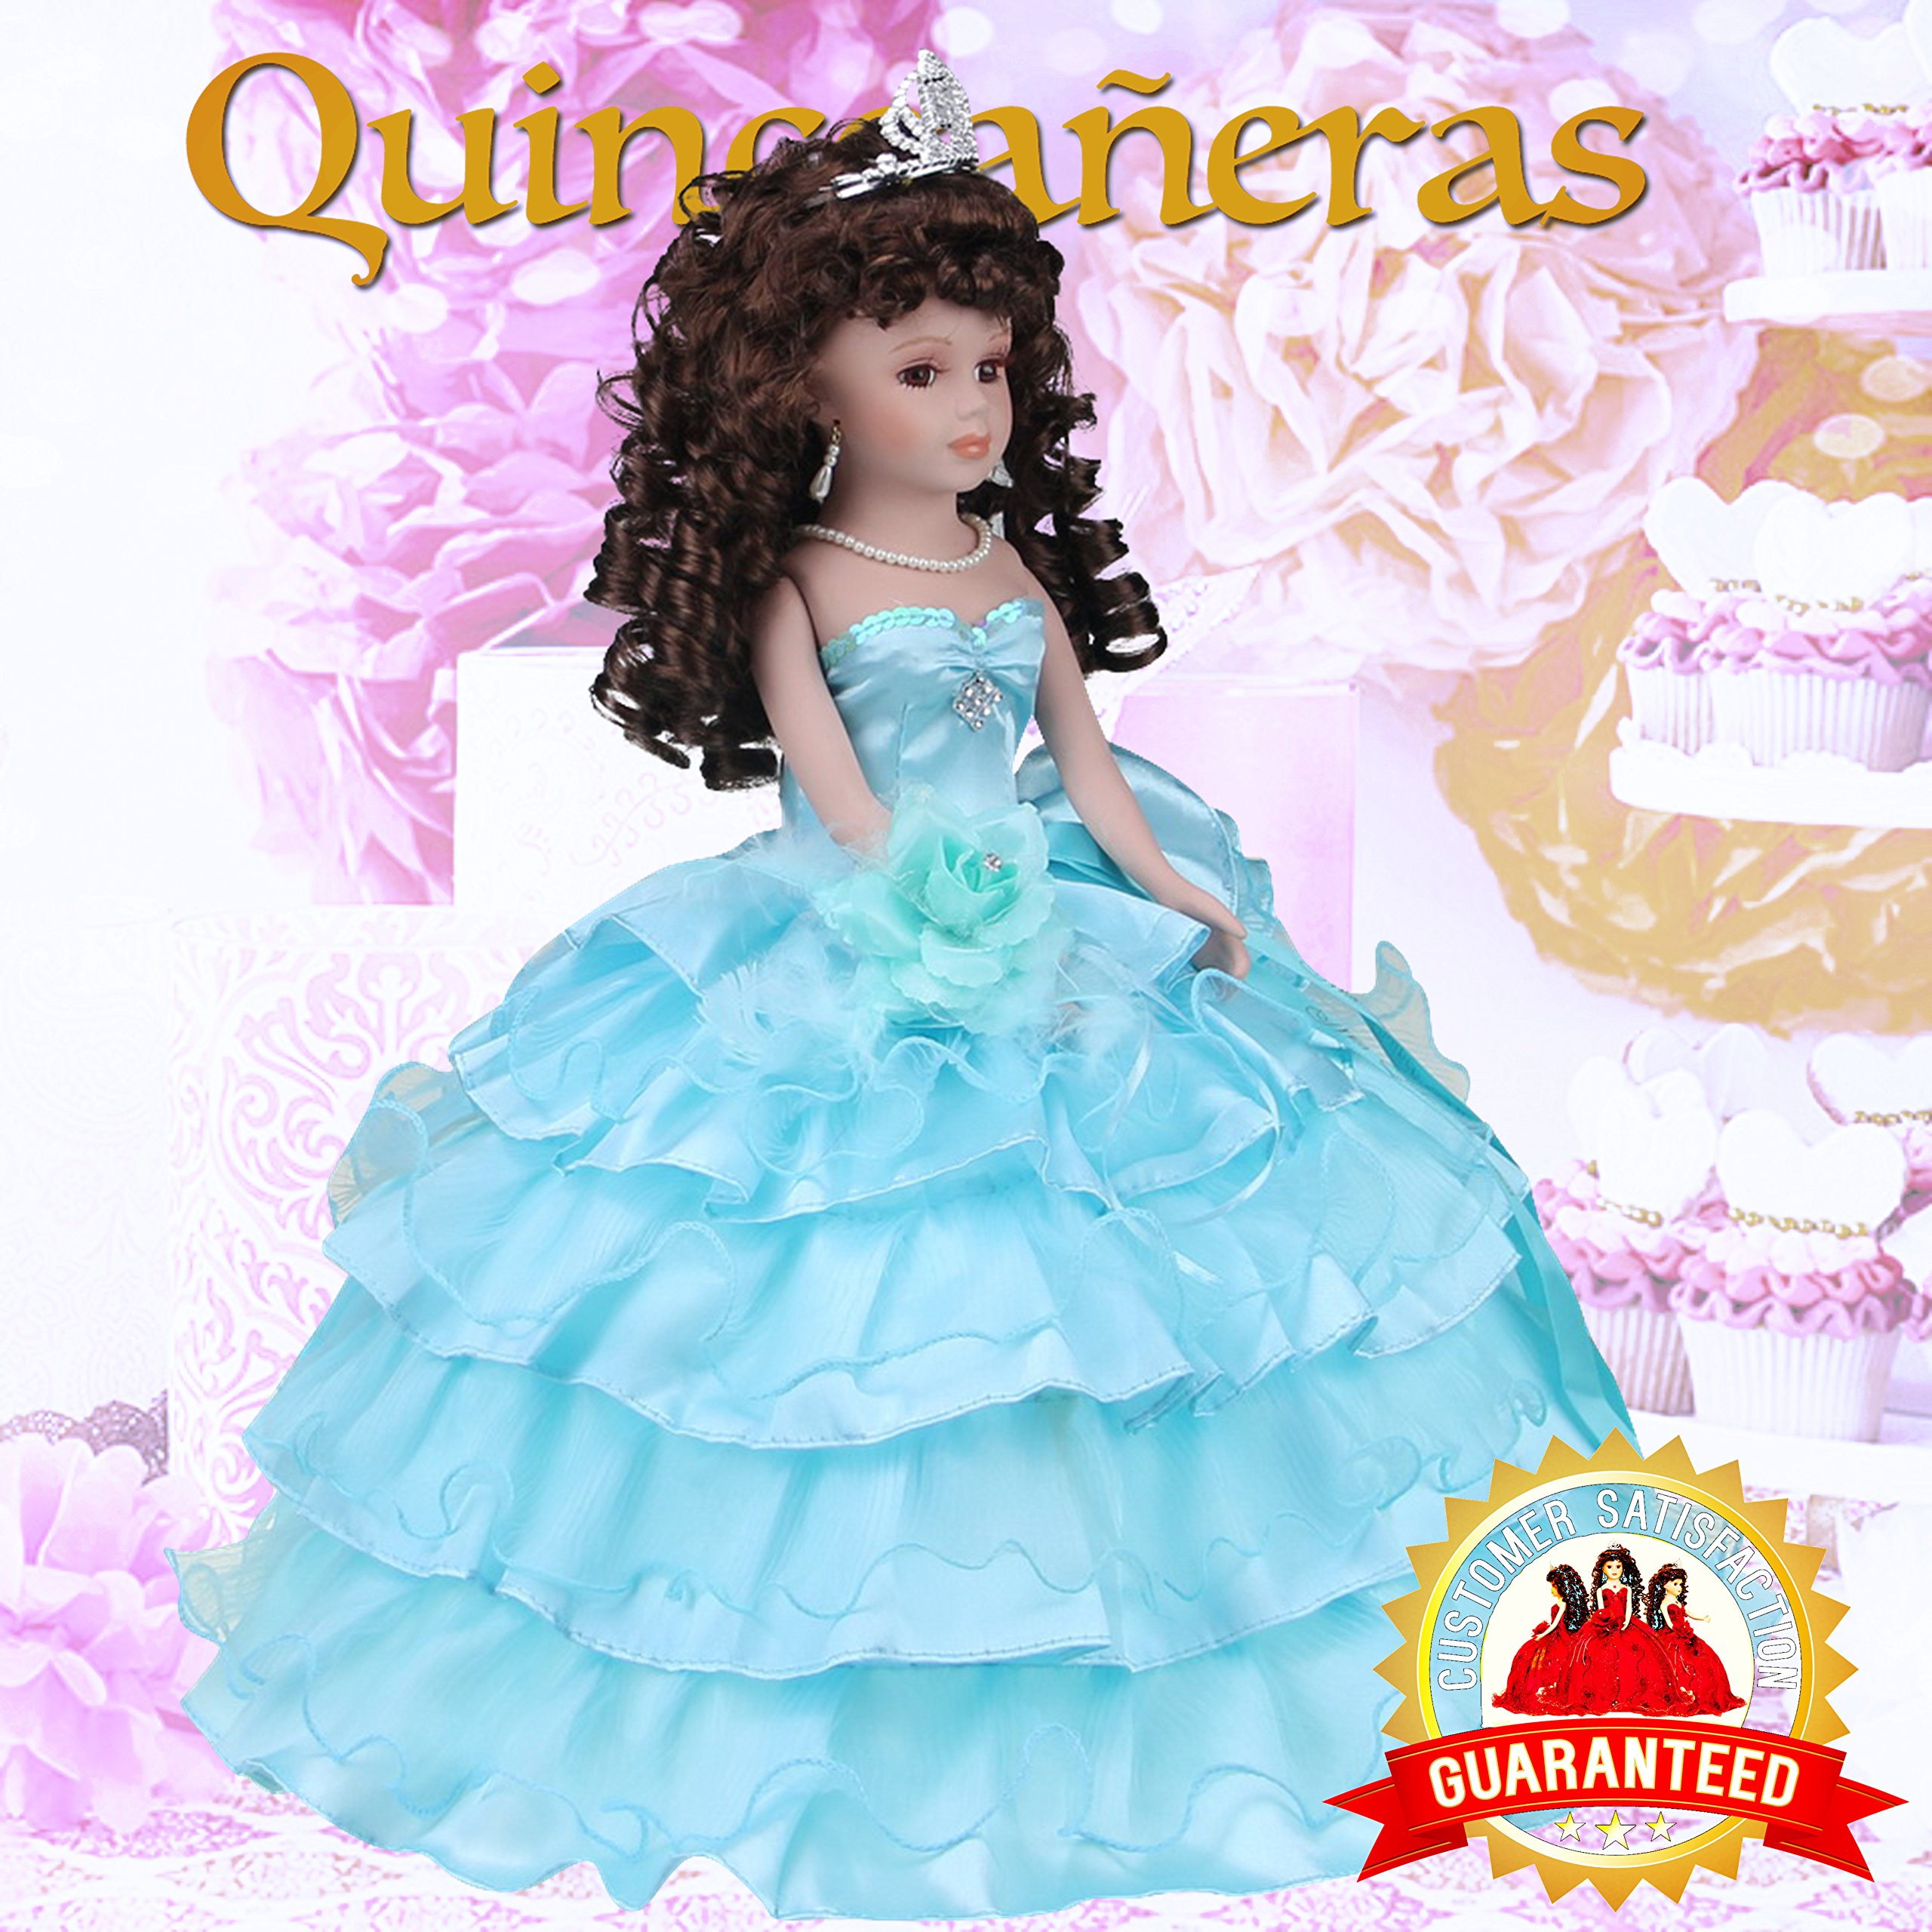 Kinnex Collections by Amanda 18'' Porcelain Quinceanera Umbrella Doll (Table Centerpiece)~ Aqua ~ KK18729-23